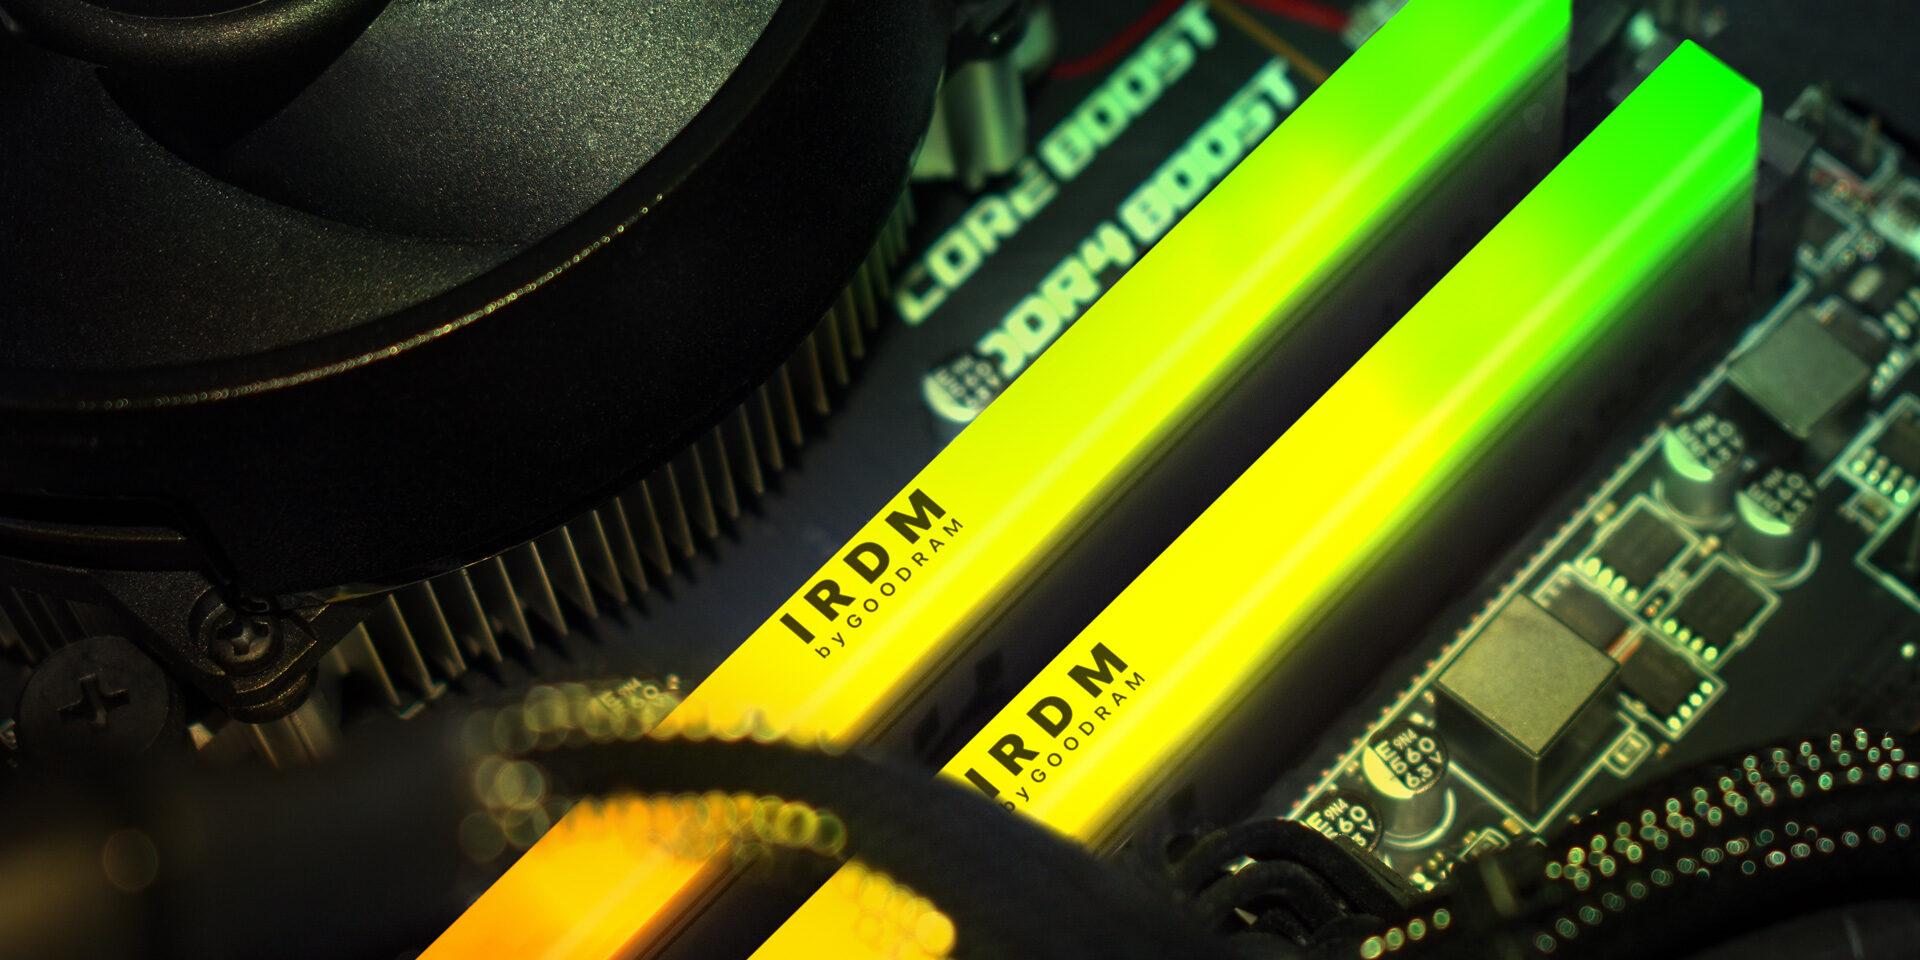 GOODRAM IRDM RGB DDR4 RAM